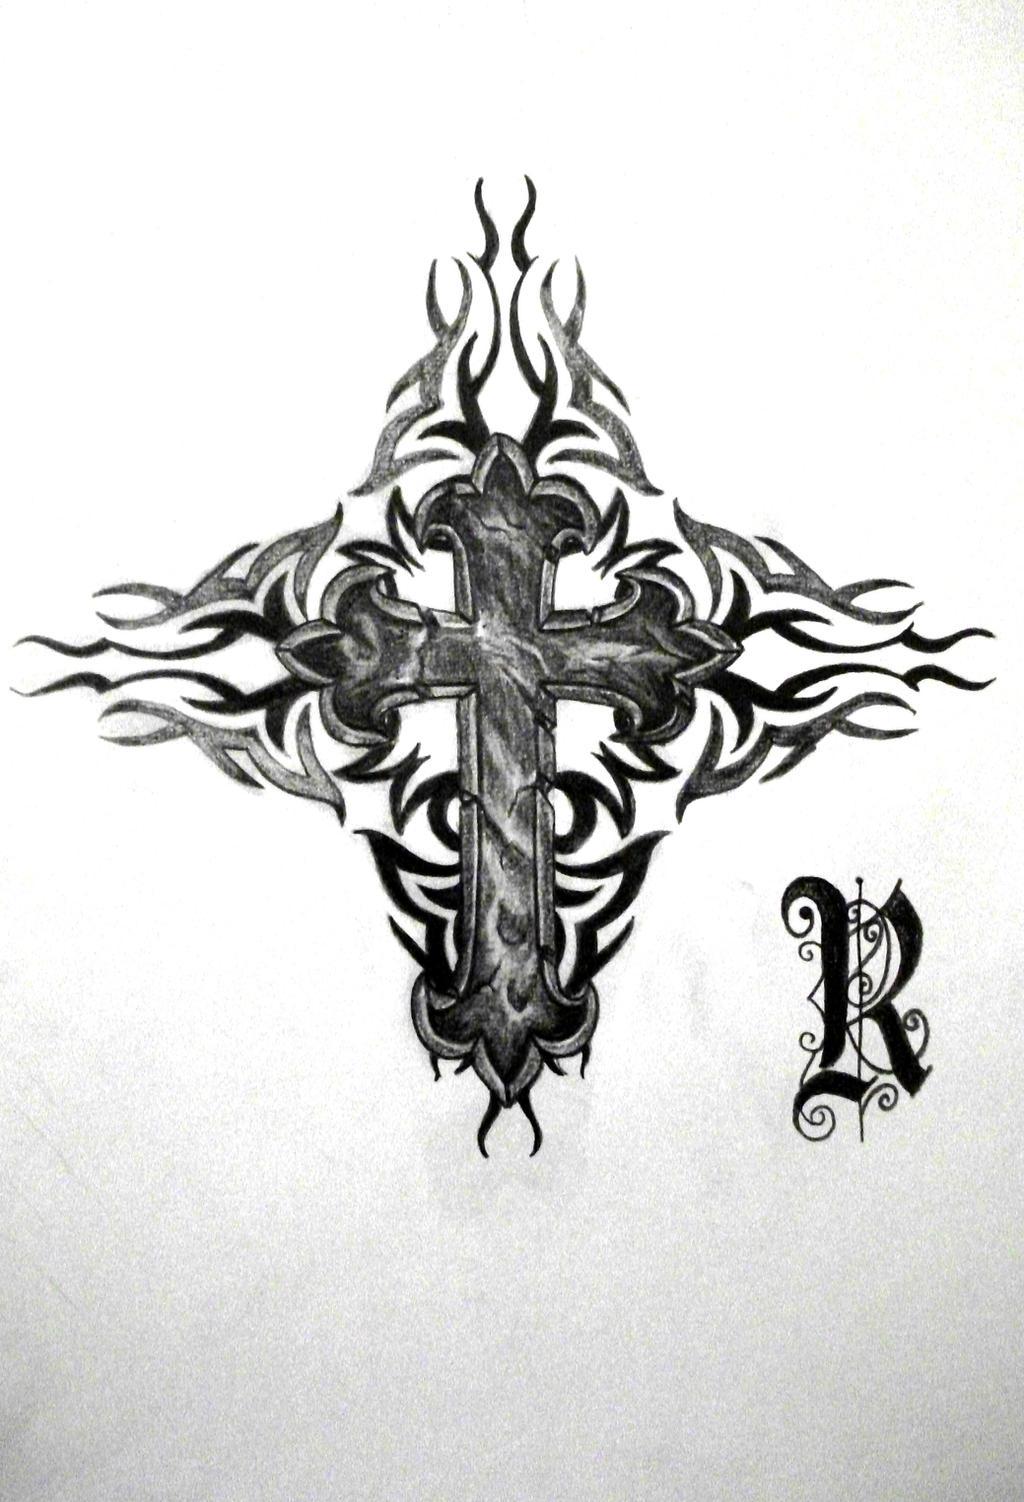 Mayan's Cross...By Rusty...2013 by RealityBitez on DeviantArt